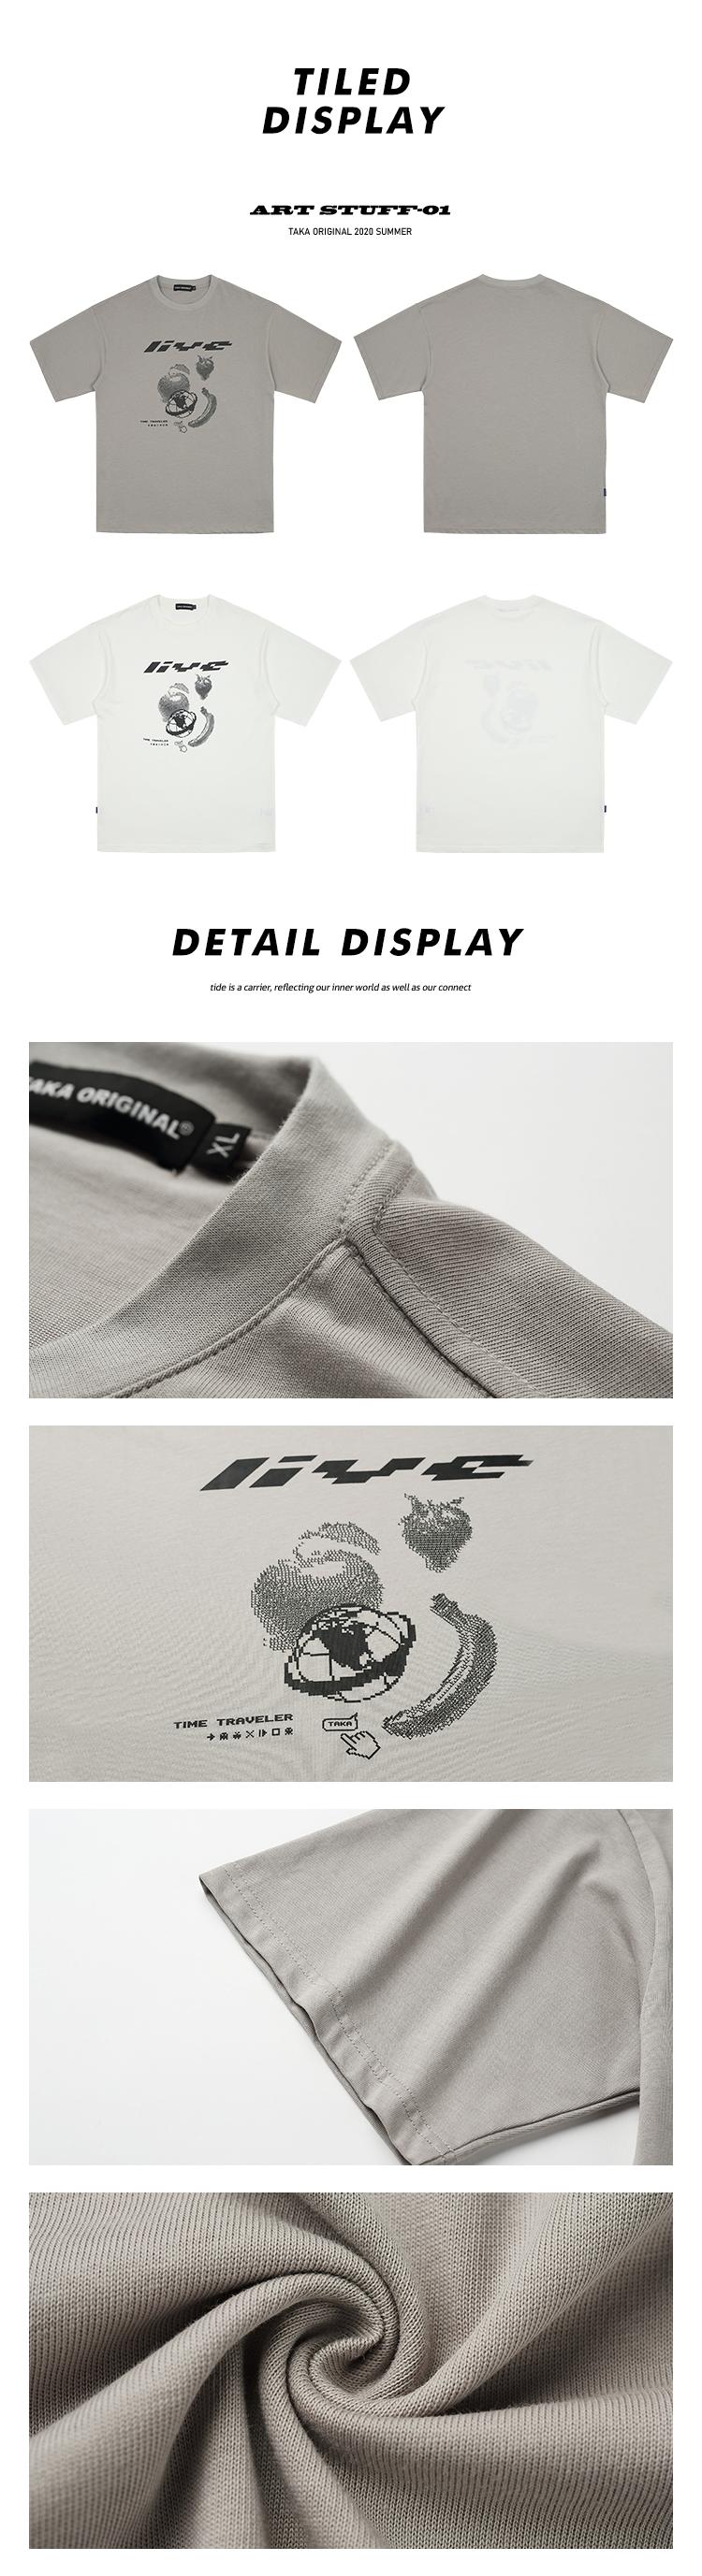 taka original 20SS pixelated pirnt laid back unisex cotton crewneck short sleeves t-shirt for teen